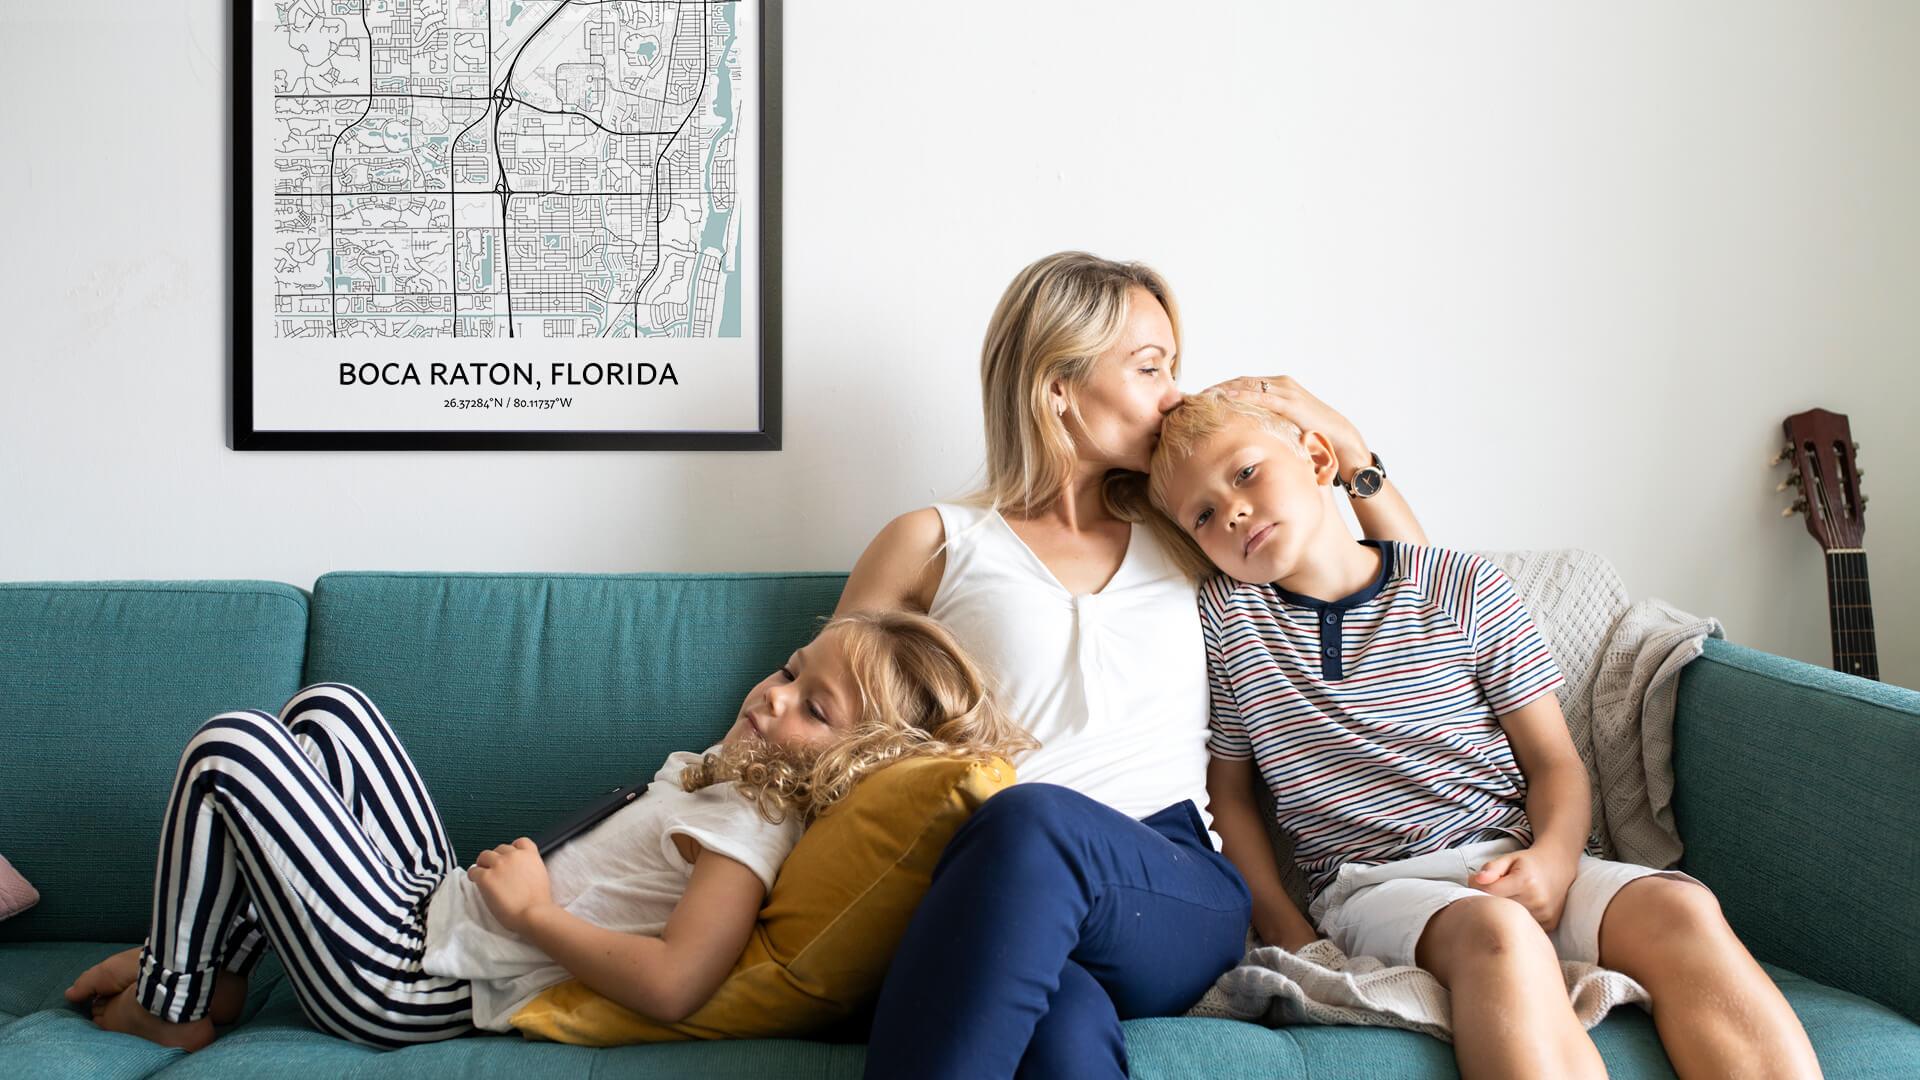 Boca Raton map poster